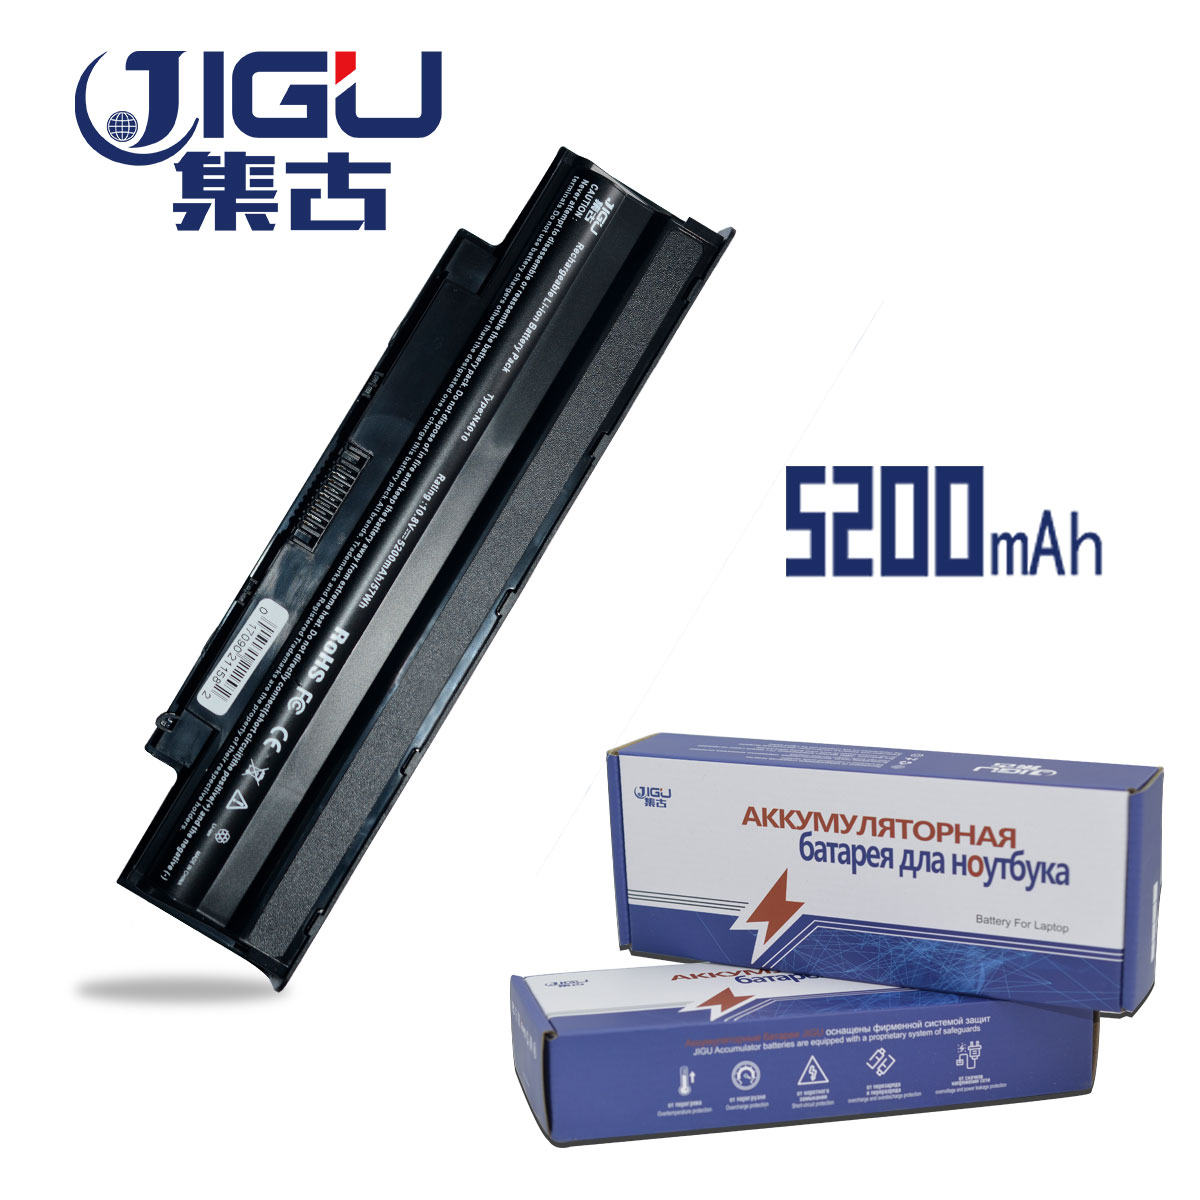 JIGU Laptop Batterie Für Dell Inspiron N7110 M5030 M5040 M501 N4050 N5030 N5040 N5050 N4120 M501R 312-1201 451 -11510 J1knd 3450